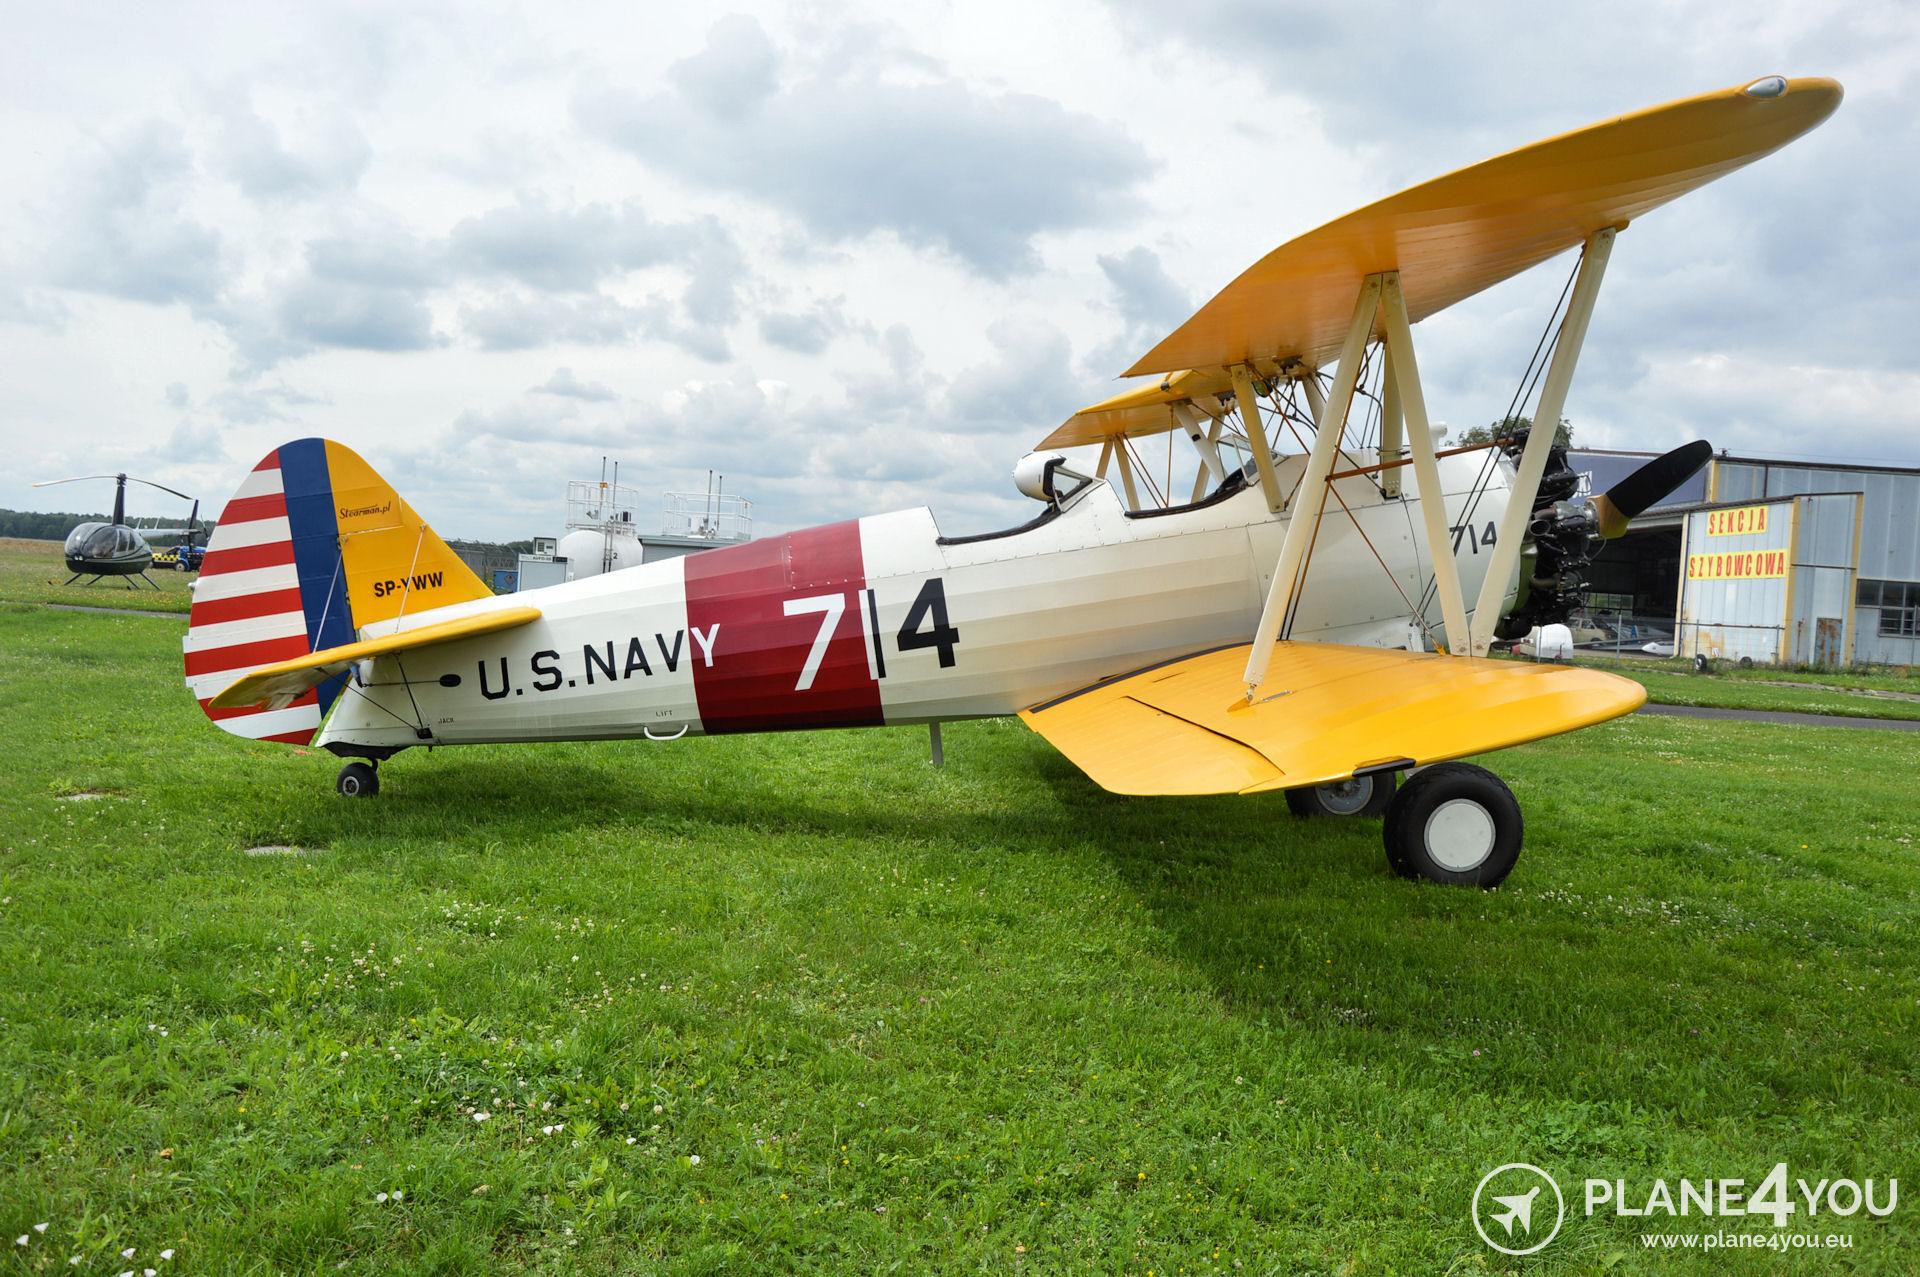 88  BOEING B75 STEARMAN SP-YWW   Sold aircraft   Plane4You Aircraft